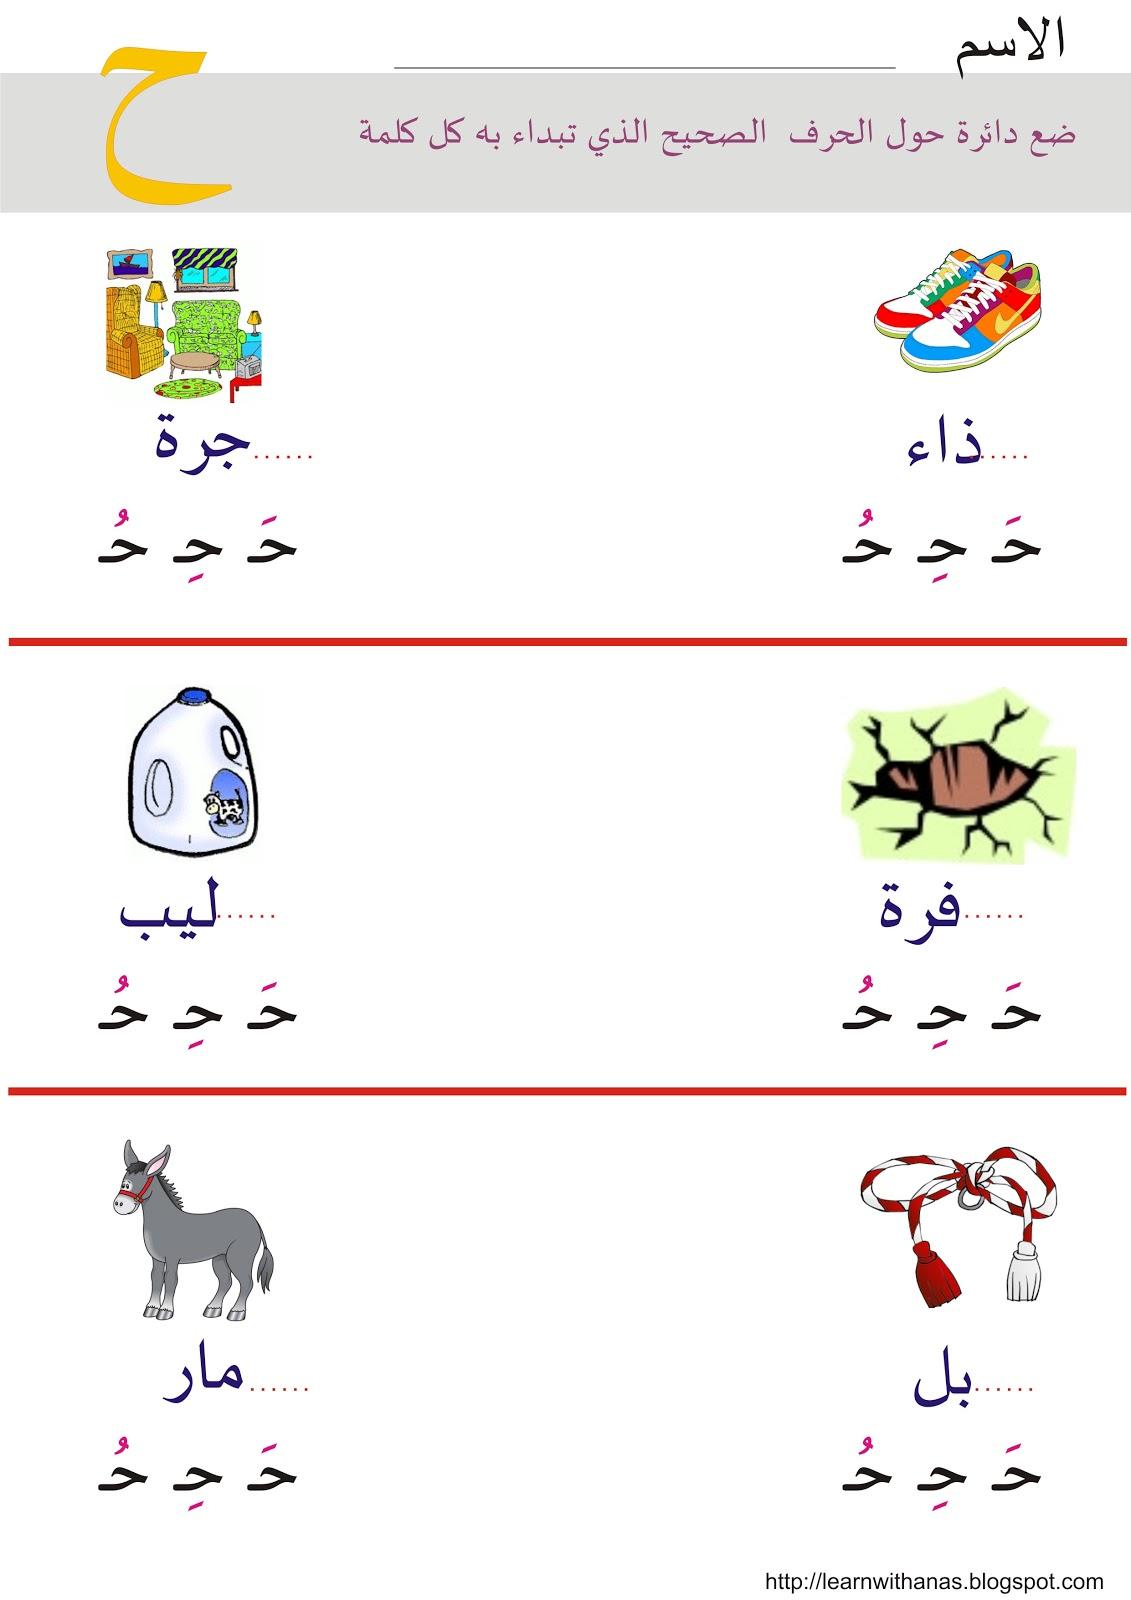 Learn arabic tashkeel art